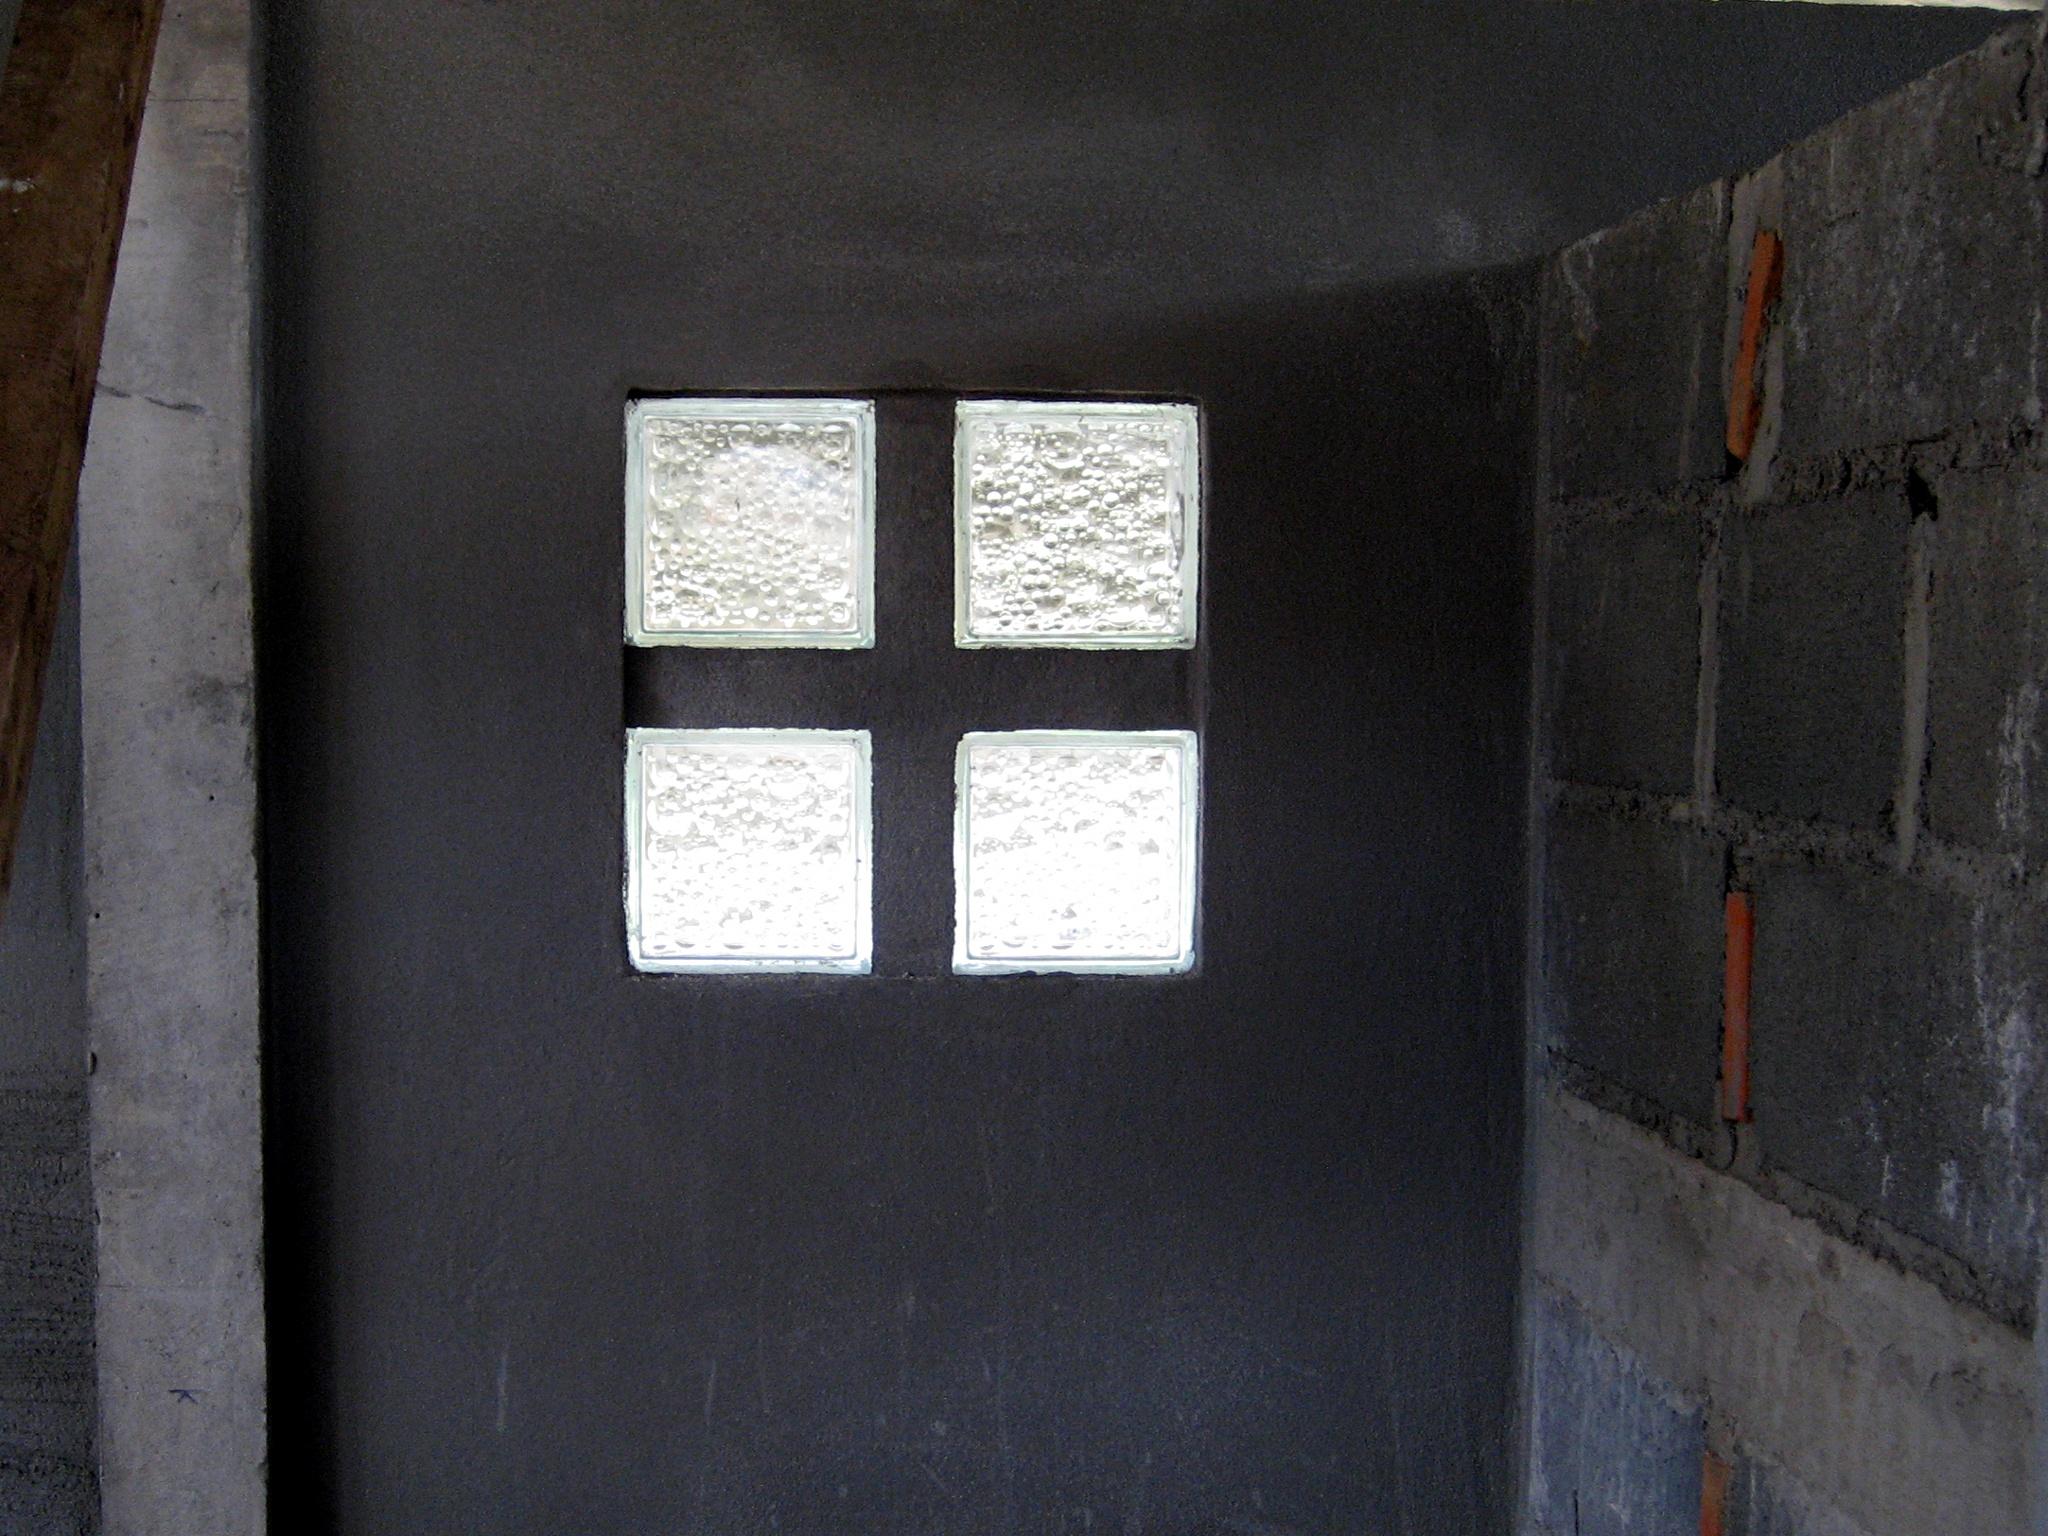 Imagens de #58443E File:Thai House Kitchen Glass Block Window.JPG Wikimedia Commons 2048x1536 px 3344 Bloco De Vidro No Banheiro